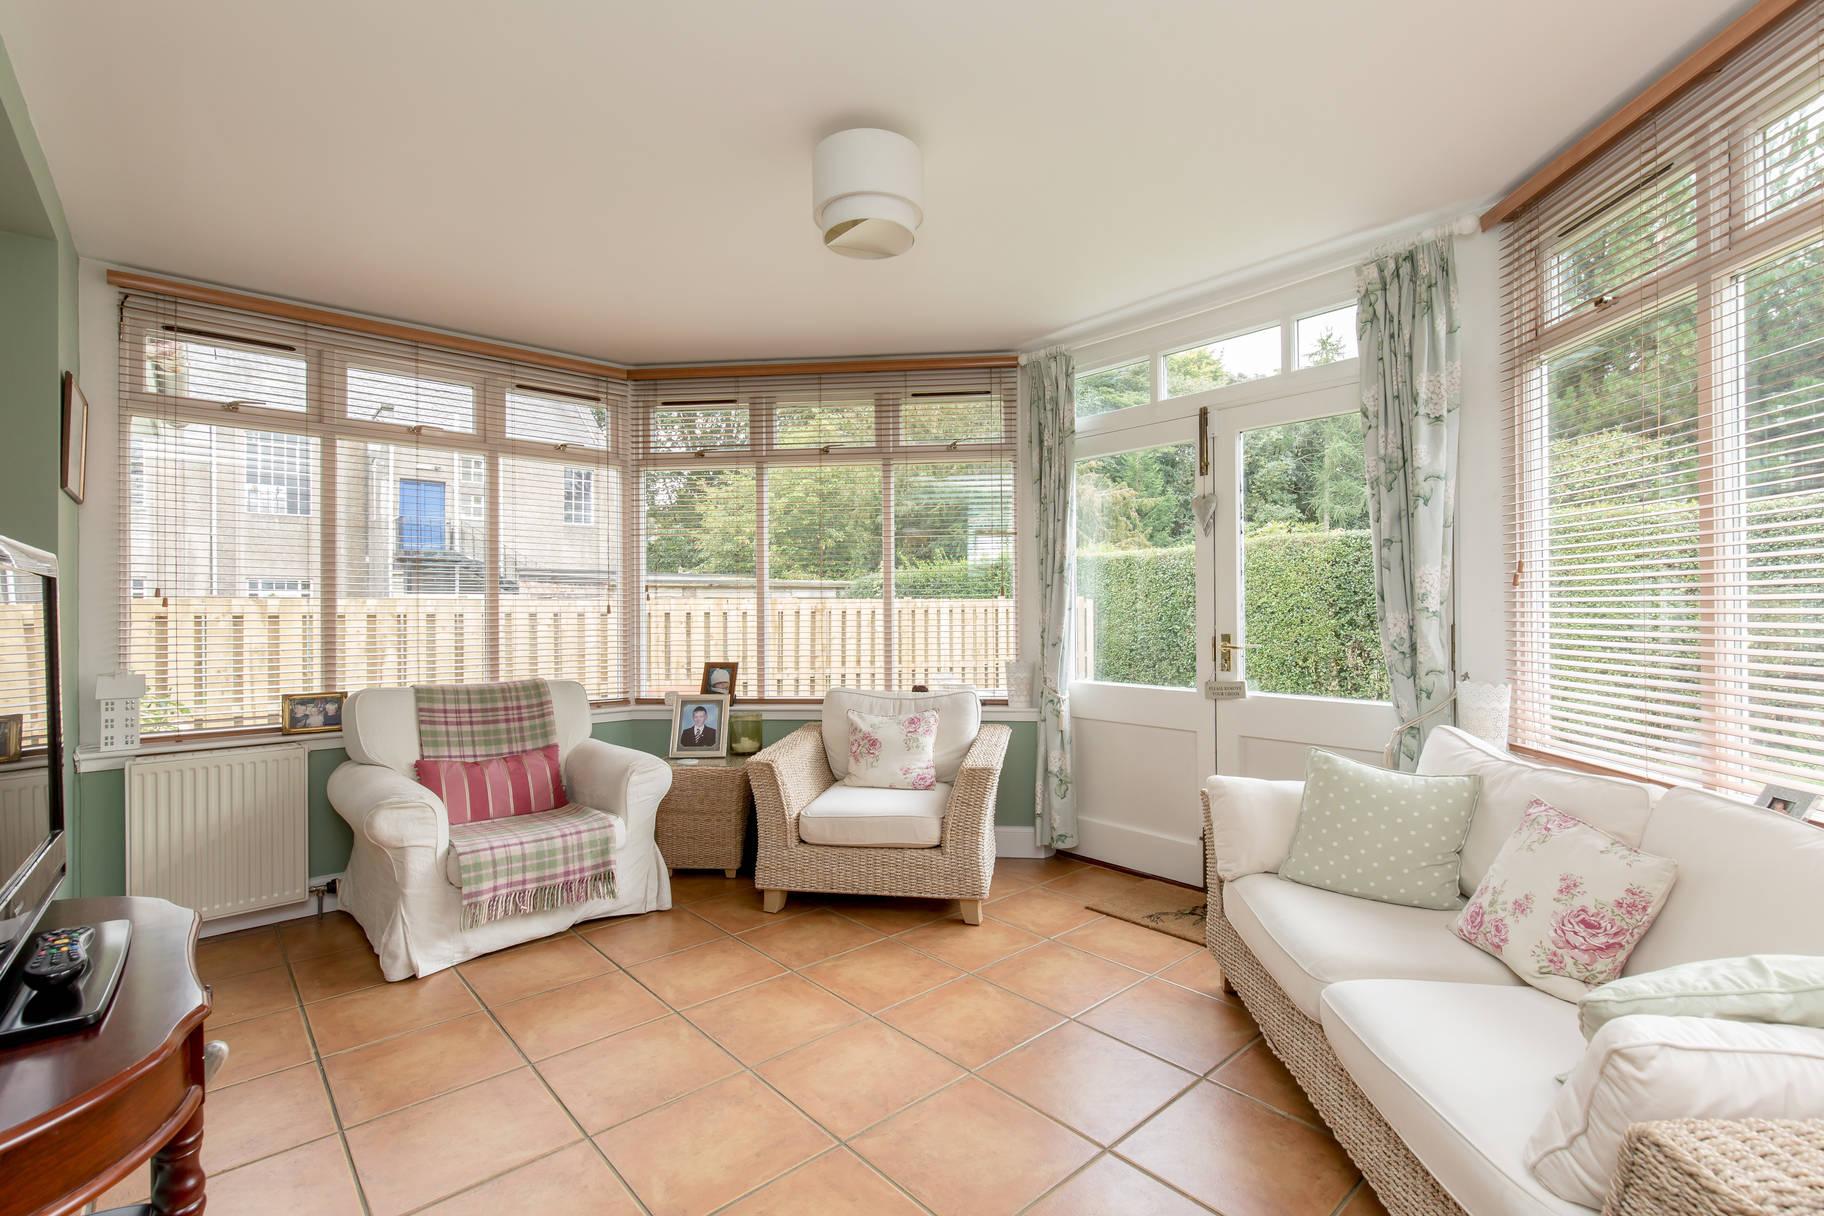 20 Dreghorn Loan, Colinton, Edinburgh, EH13 0DE